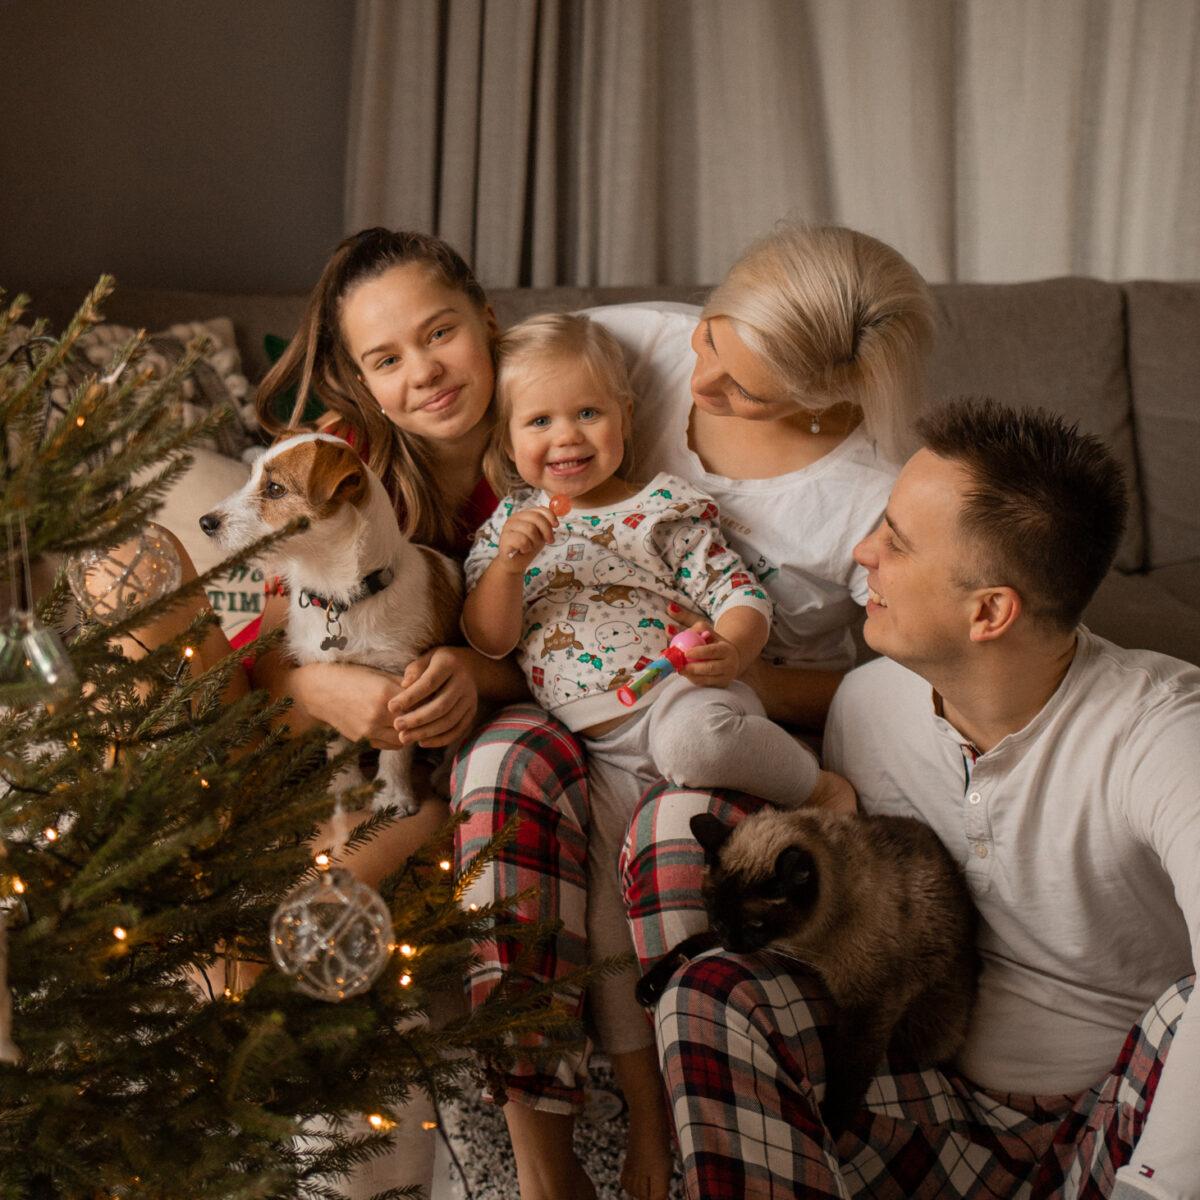 Kodune jõulufotosessioon